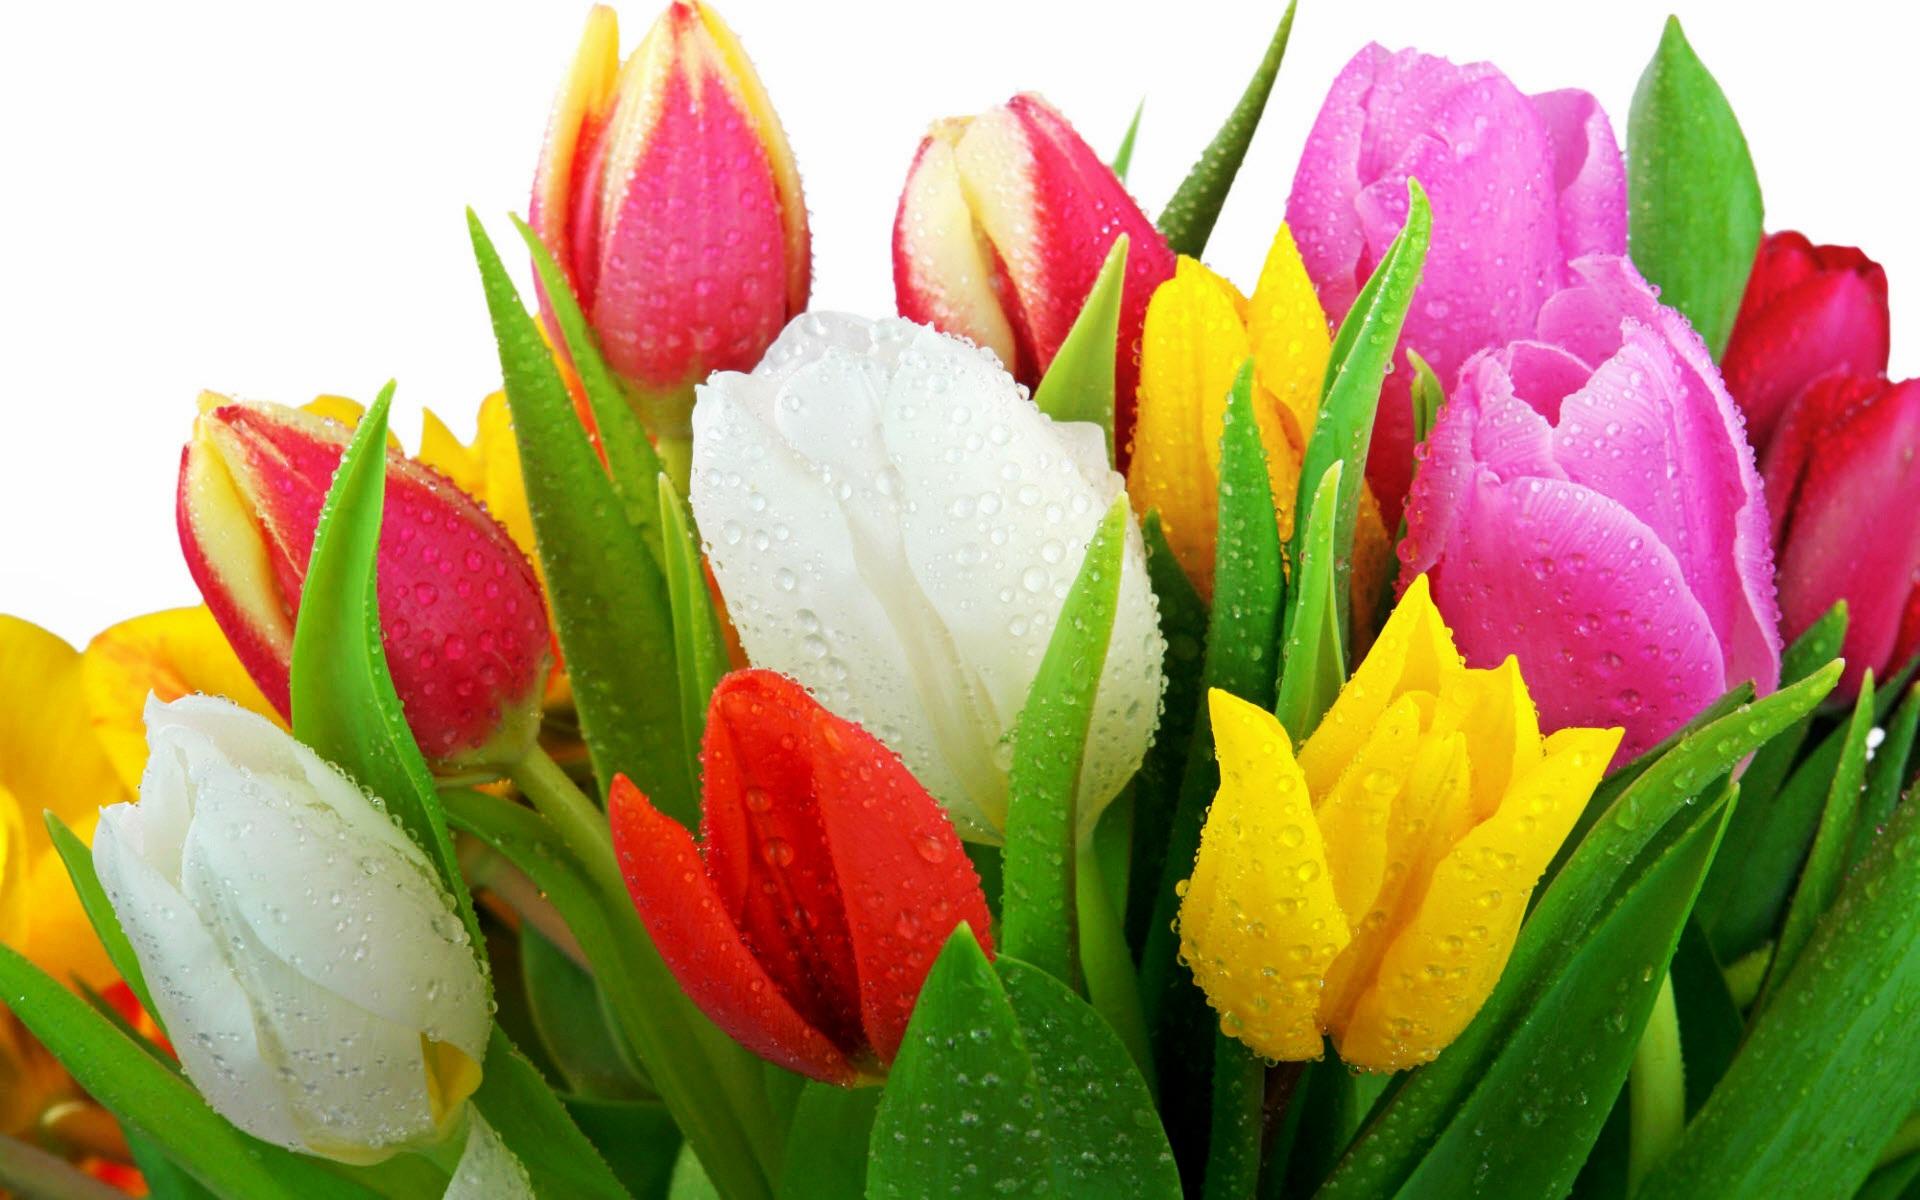 Popular flowers in Russia - tulips